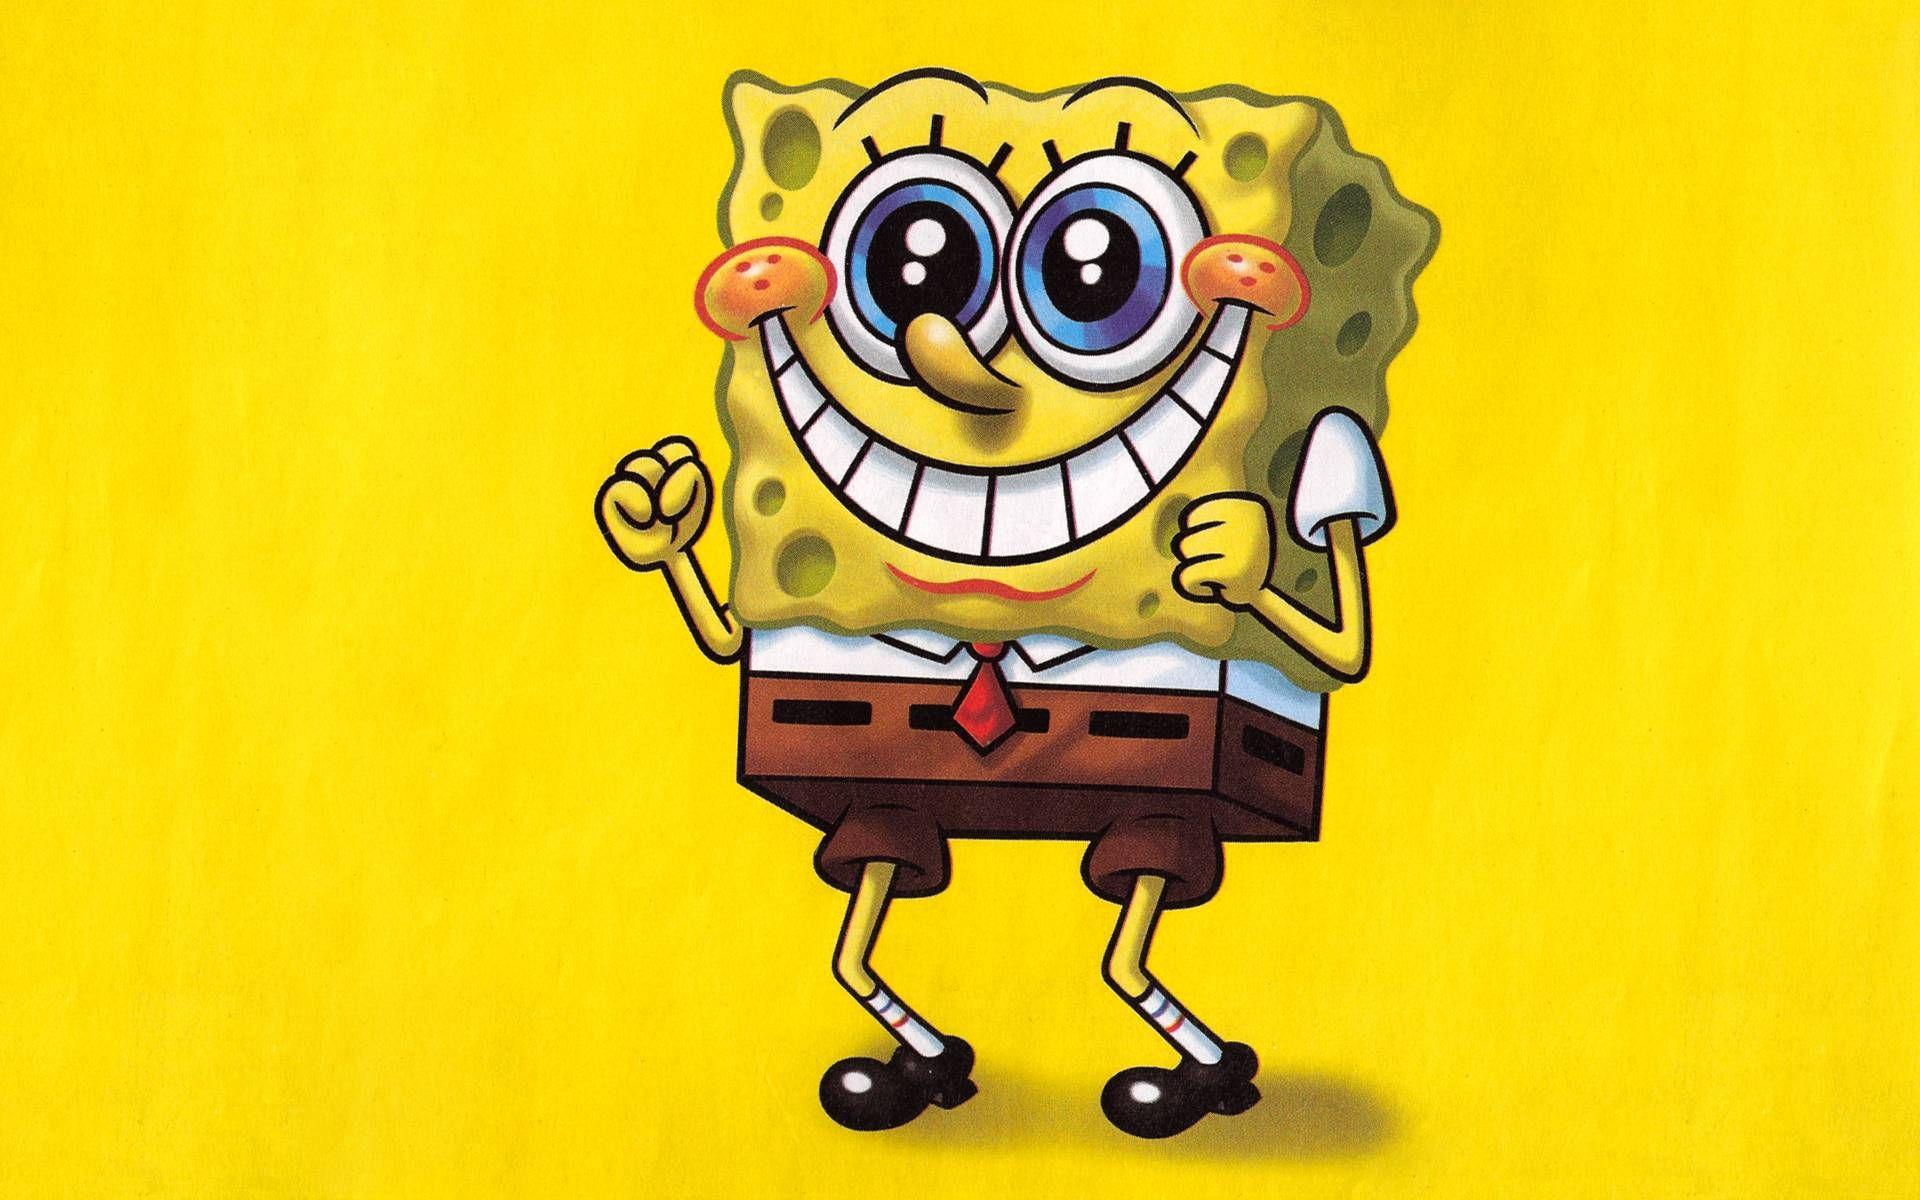 Spongebob Wallpaper High Definition Lnp Awesomeness Spongebob